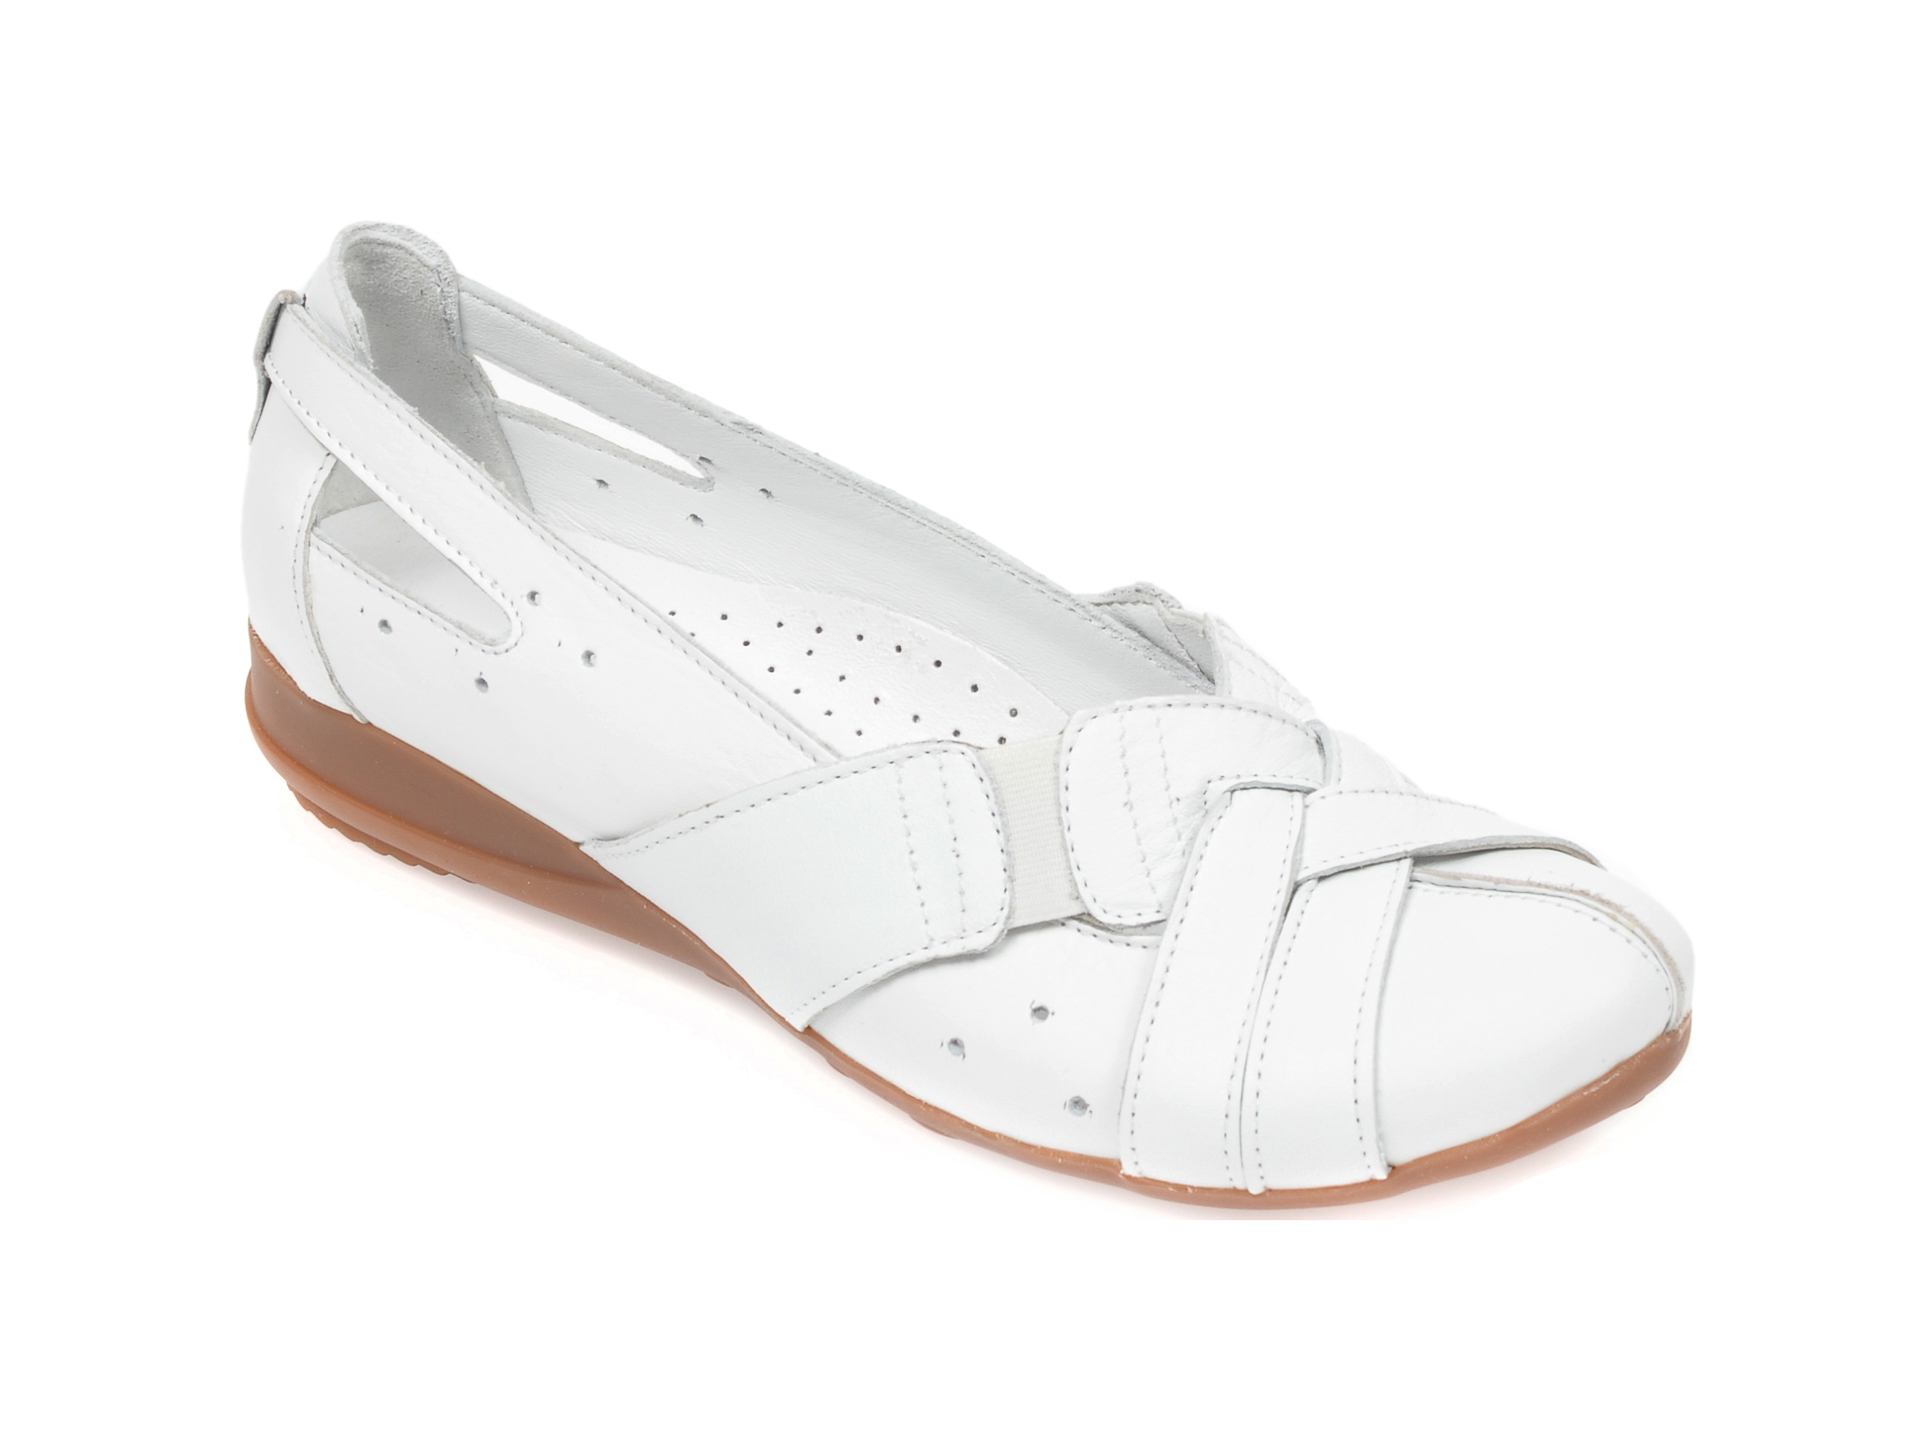 Pantofi FLAVIA PASSINI albi, 0301, din piele naturala imagine